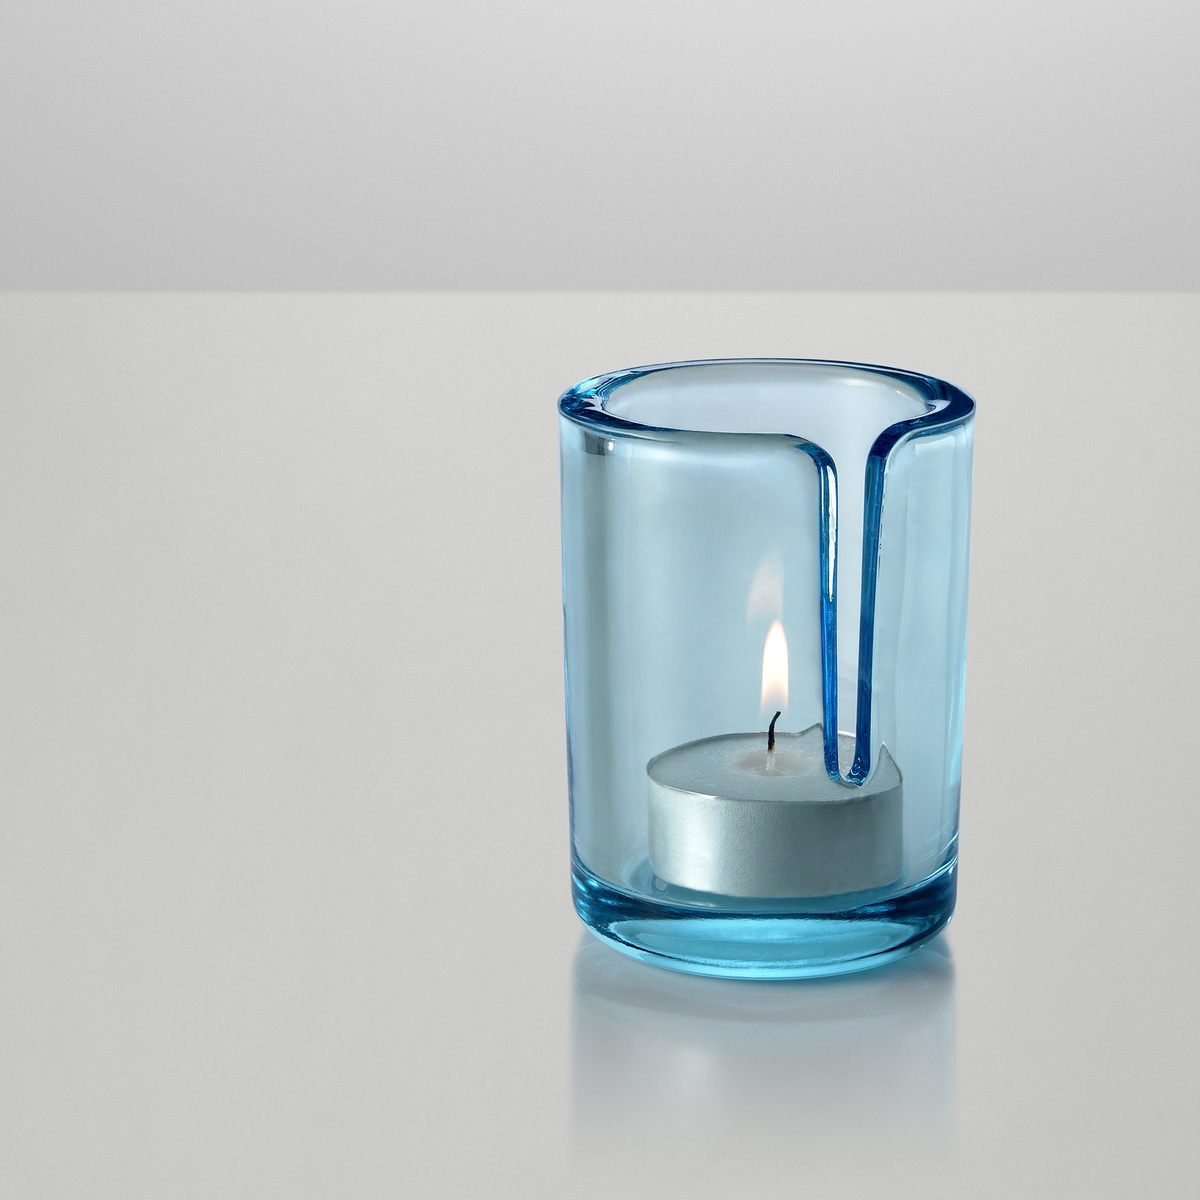 Muuto Svietnik Match 8 cm, svetlo modrý